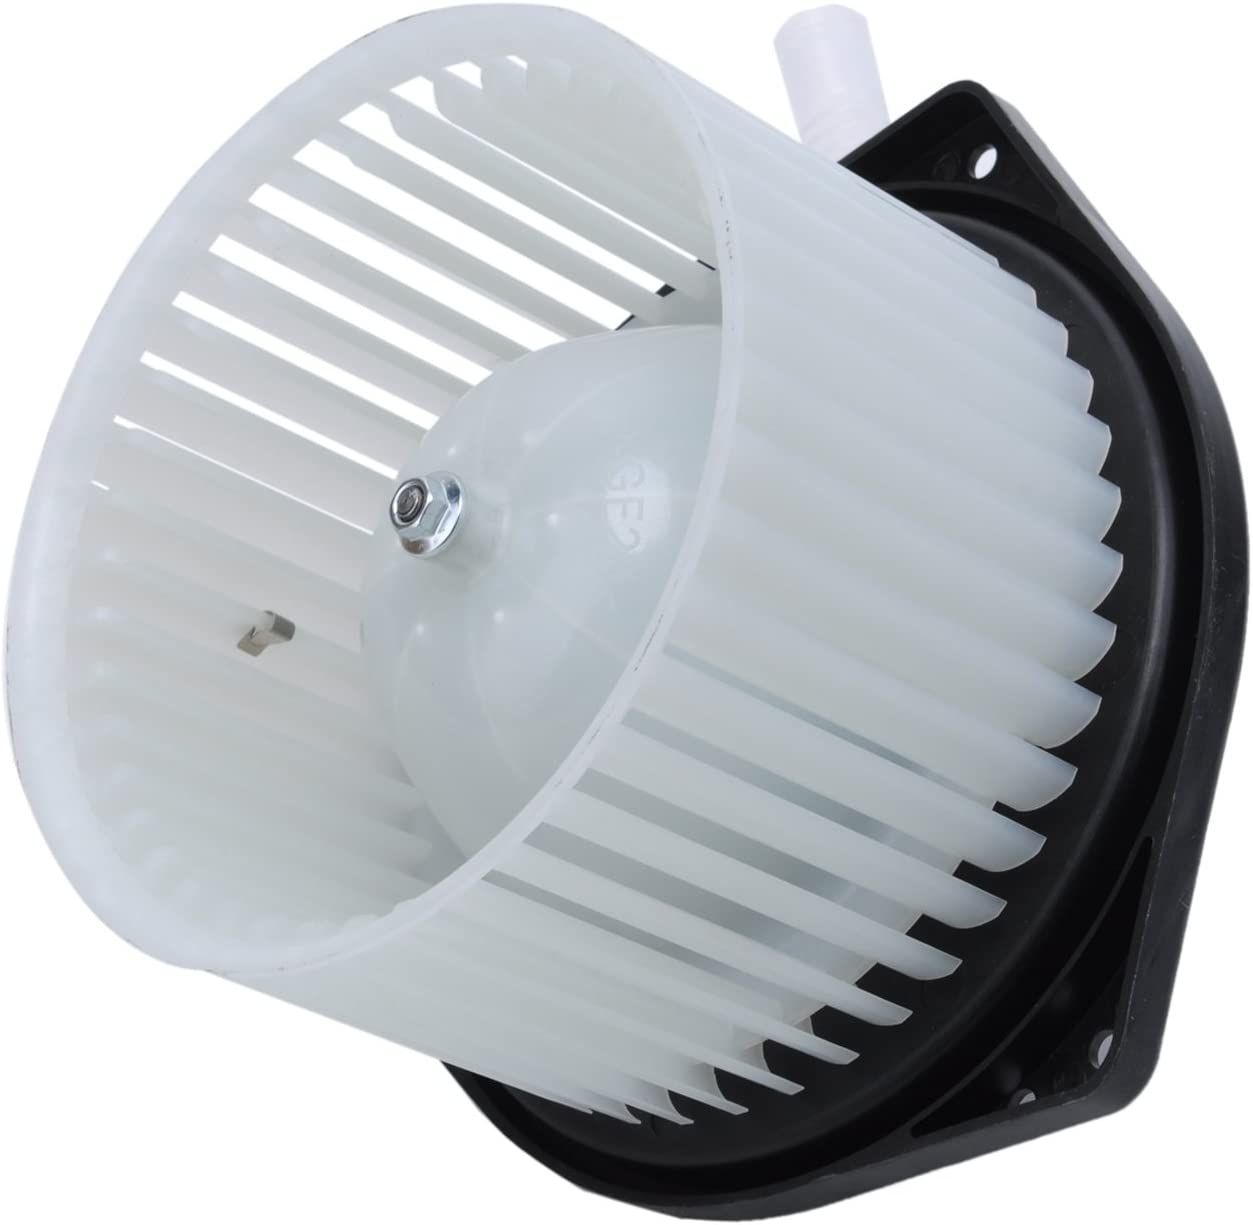 RETYLY Hvac Heater Blower Motor Resistor 7802A006 Ru-691 For Lancer Outlander Rvr 2007 2008 2009 2010 2011 2012 2013